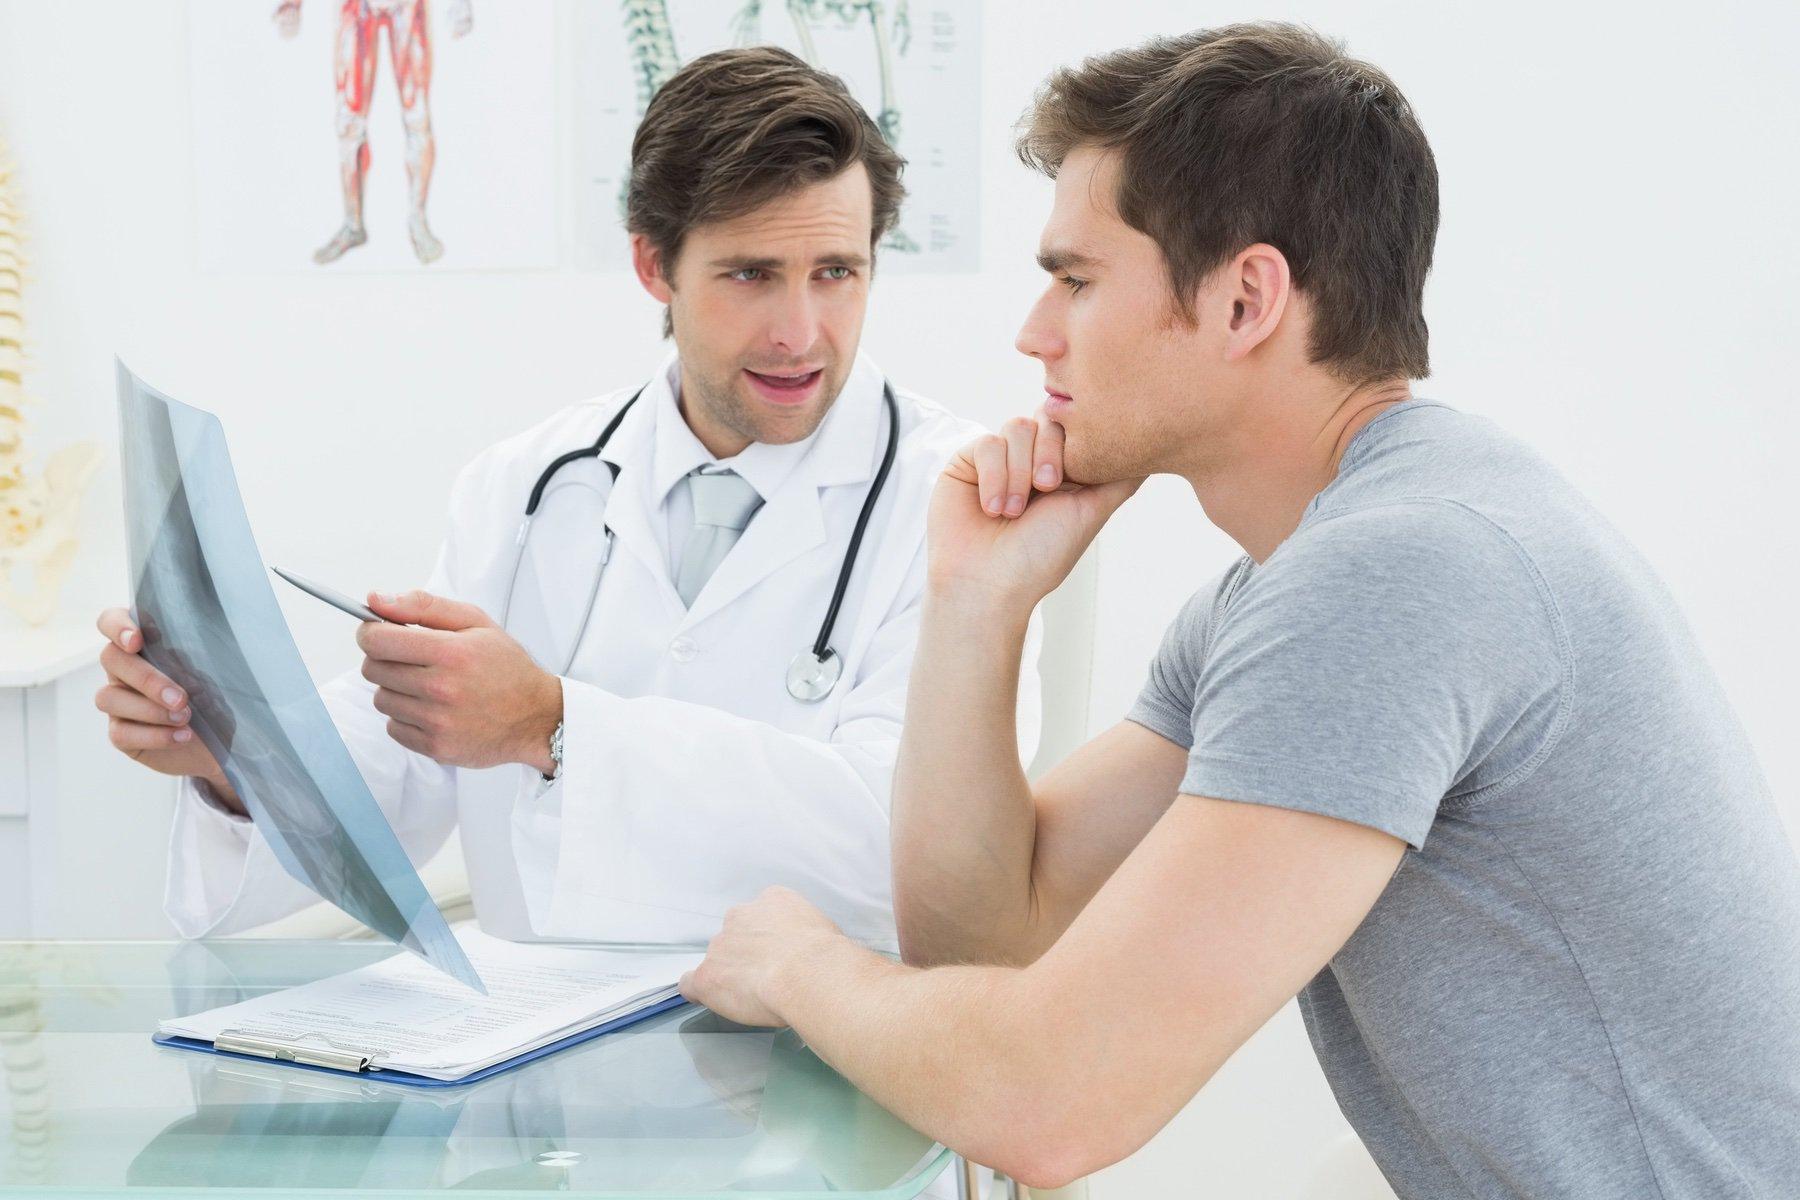 Nephrology - Kidney Location & Structure